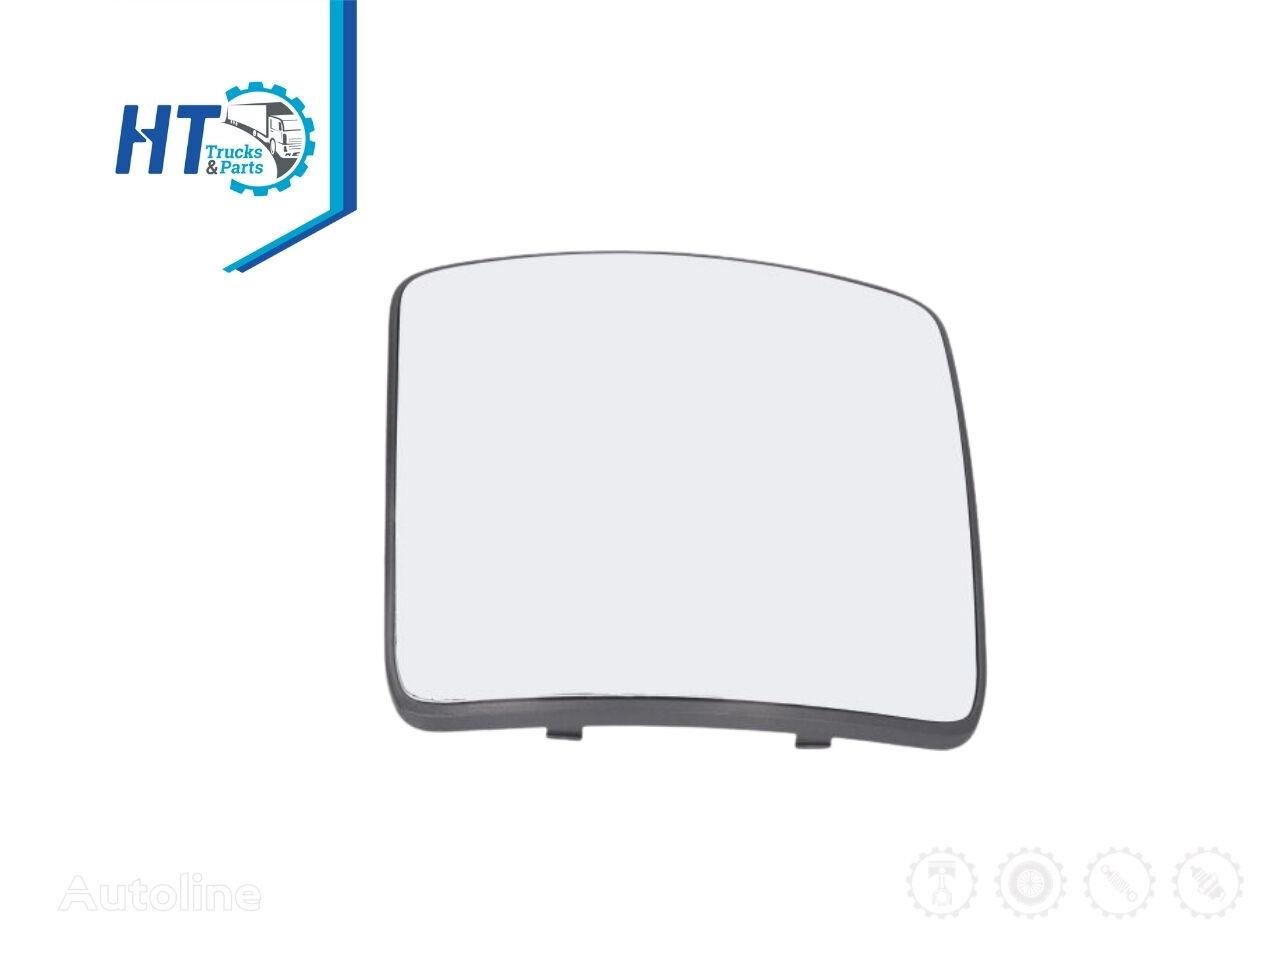 new VOLVO (82356824) rear-view mirror for VOLVO truck